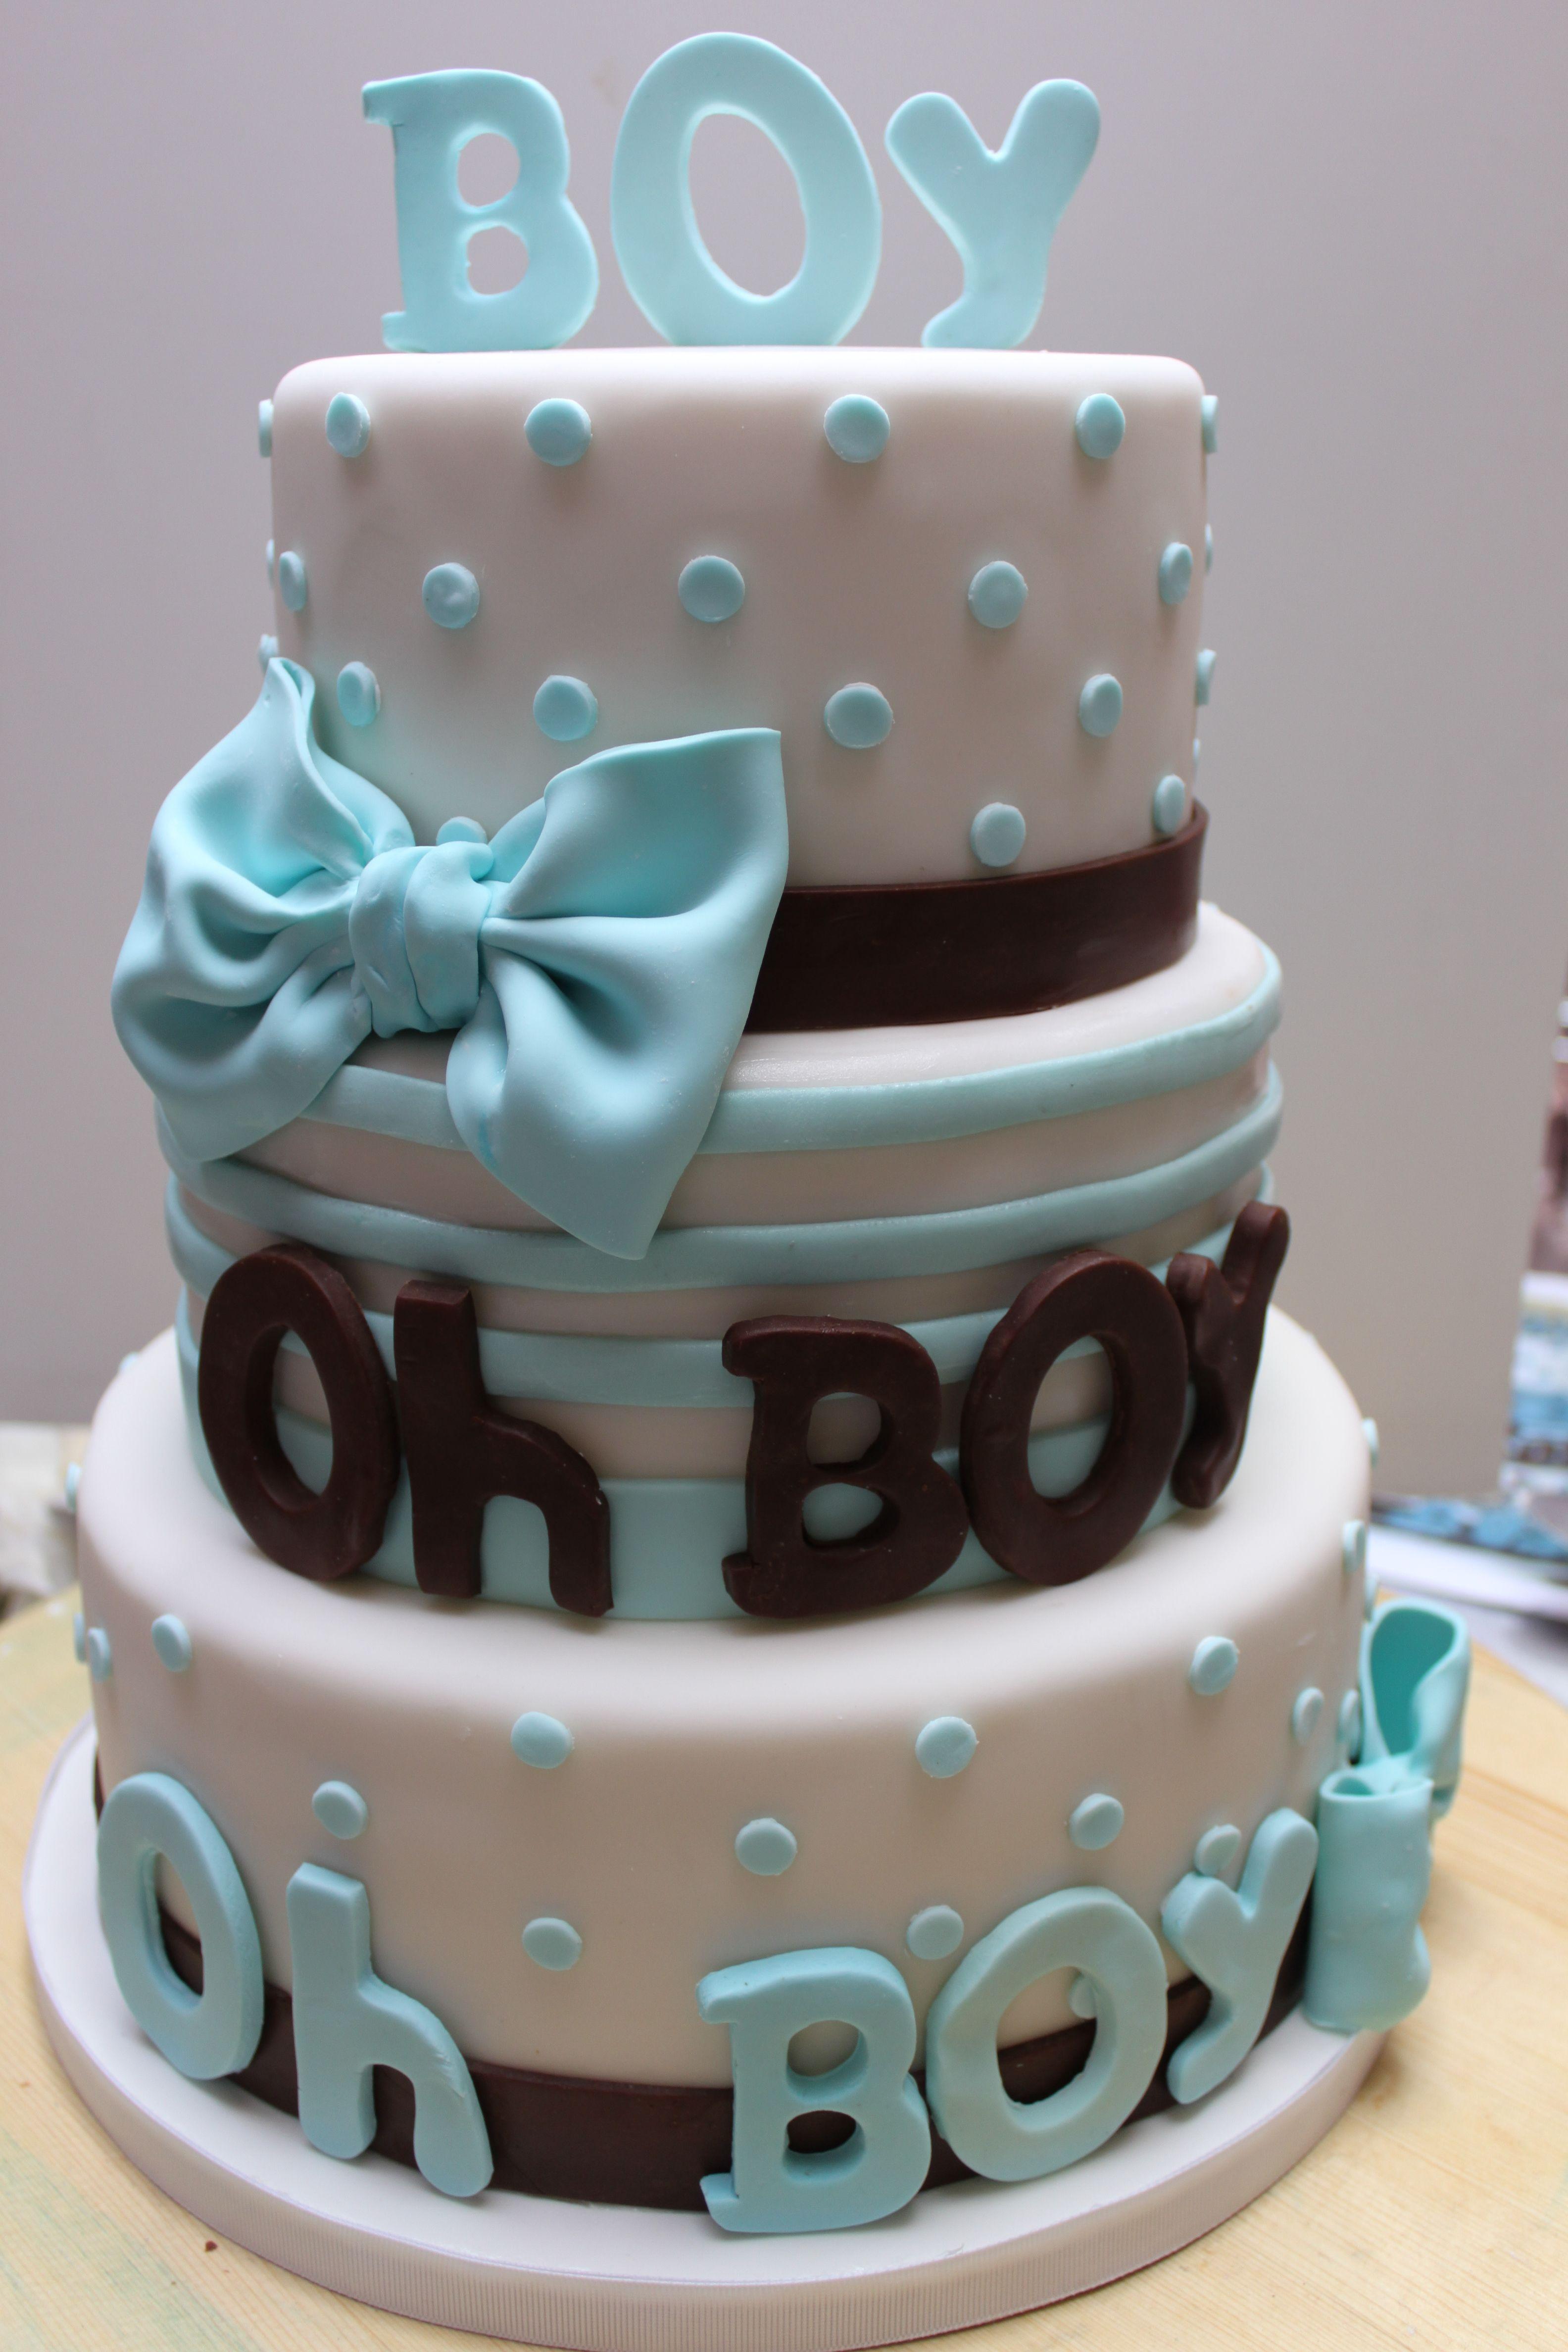 Baby boy cake perfect since ill be having boys